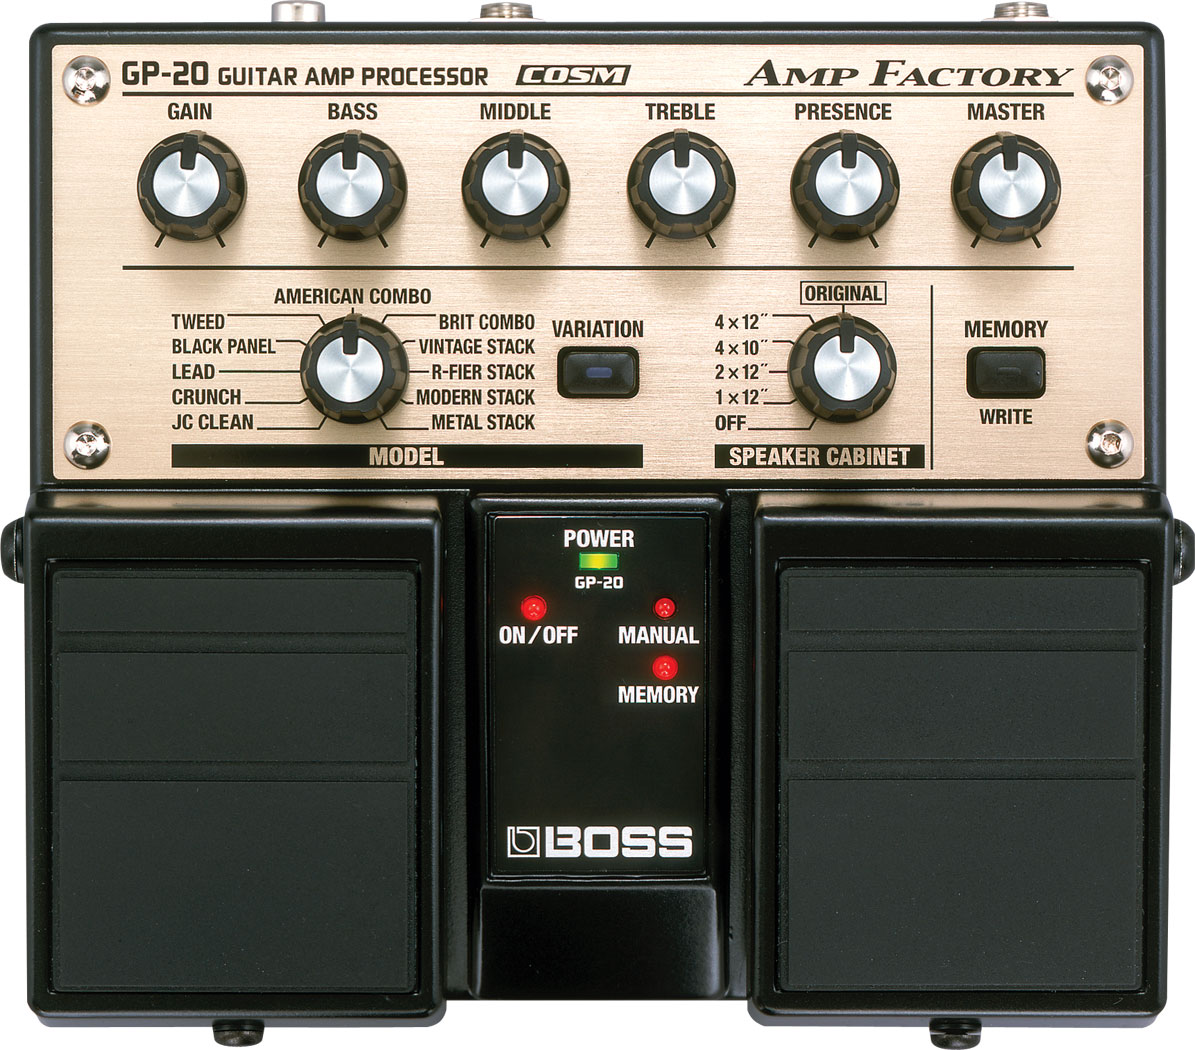 user reviews boss gp 20 amp factory audiofanzine. Black Bedroom Furniture Sets. Home Design Ideas